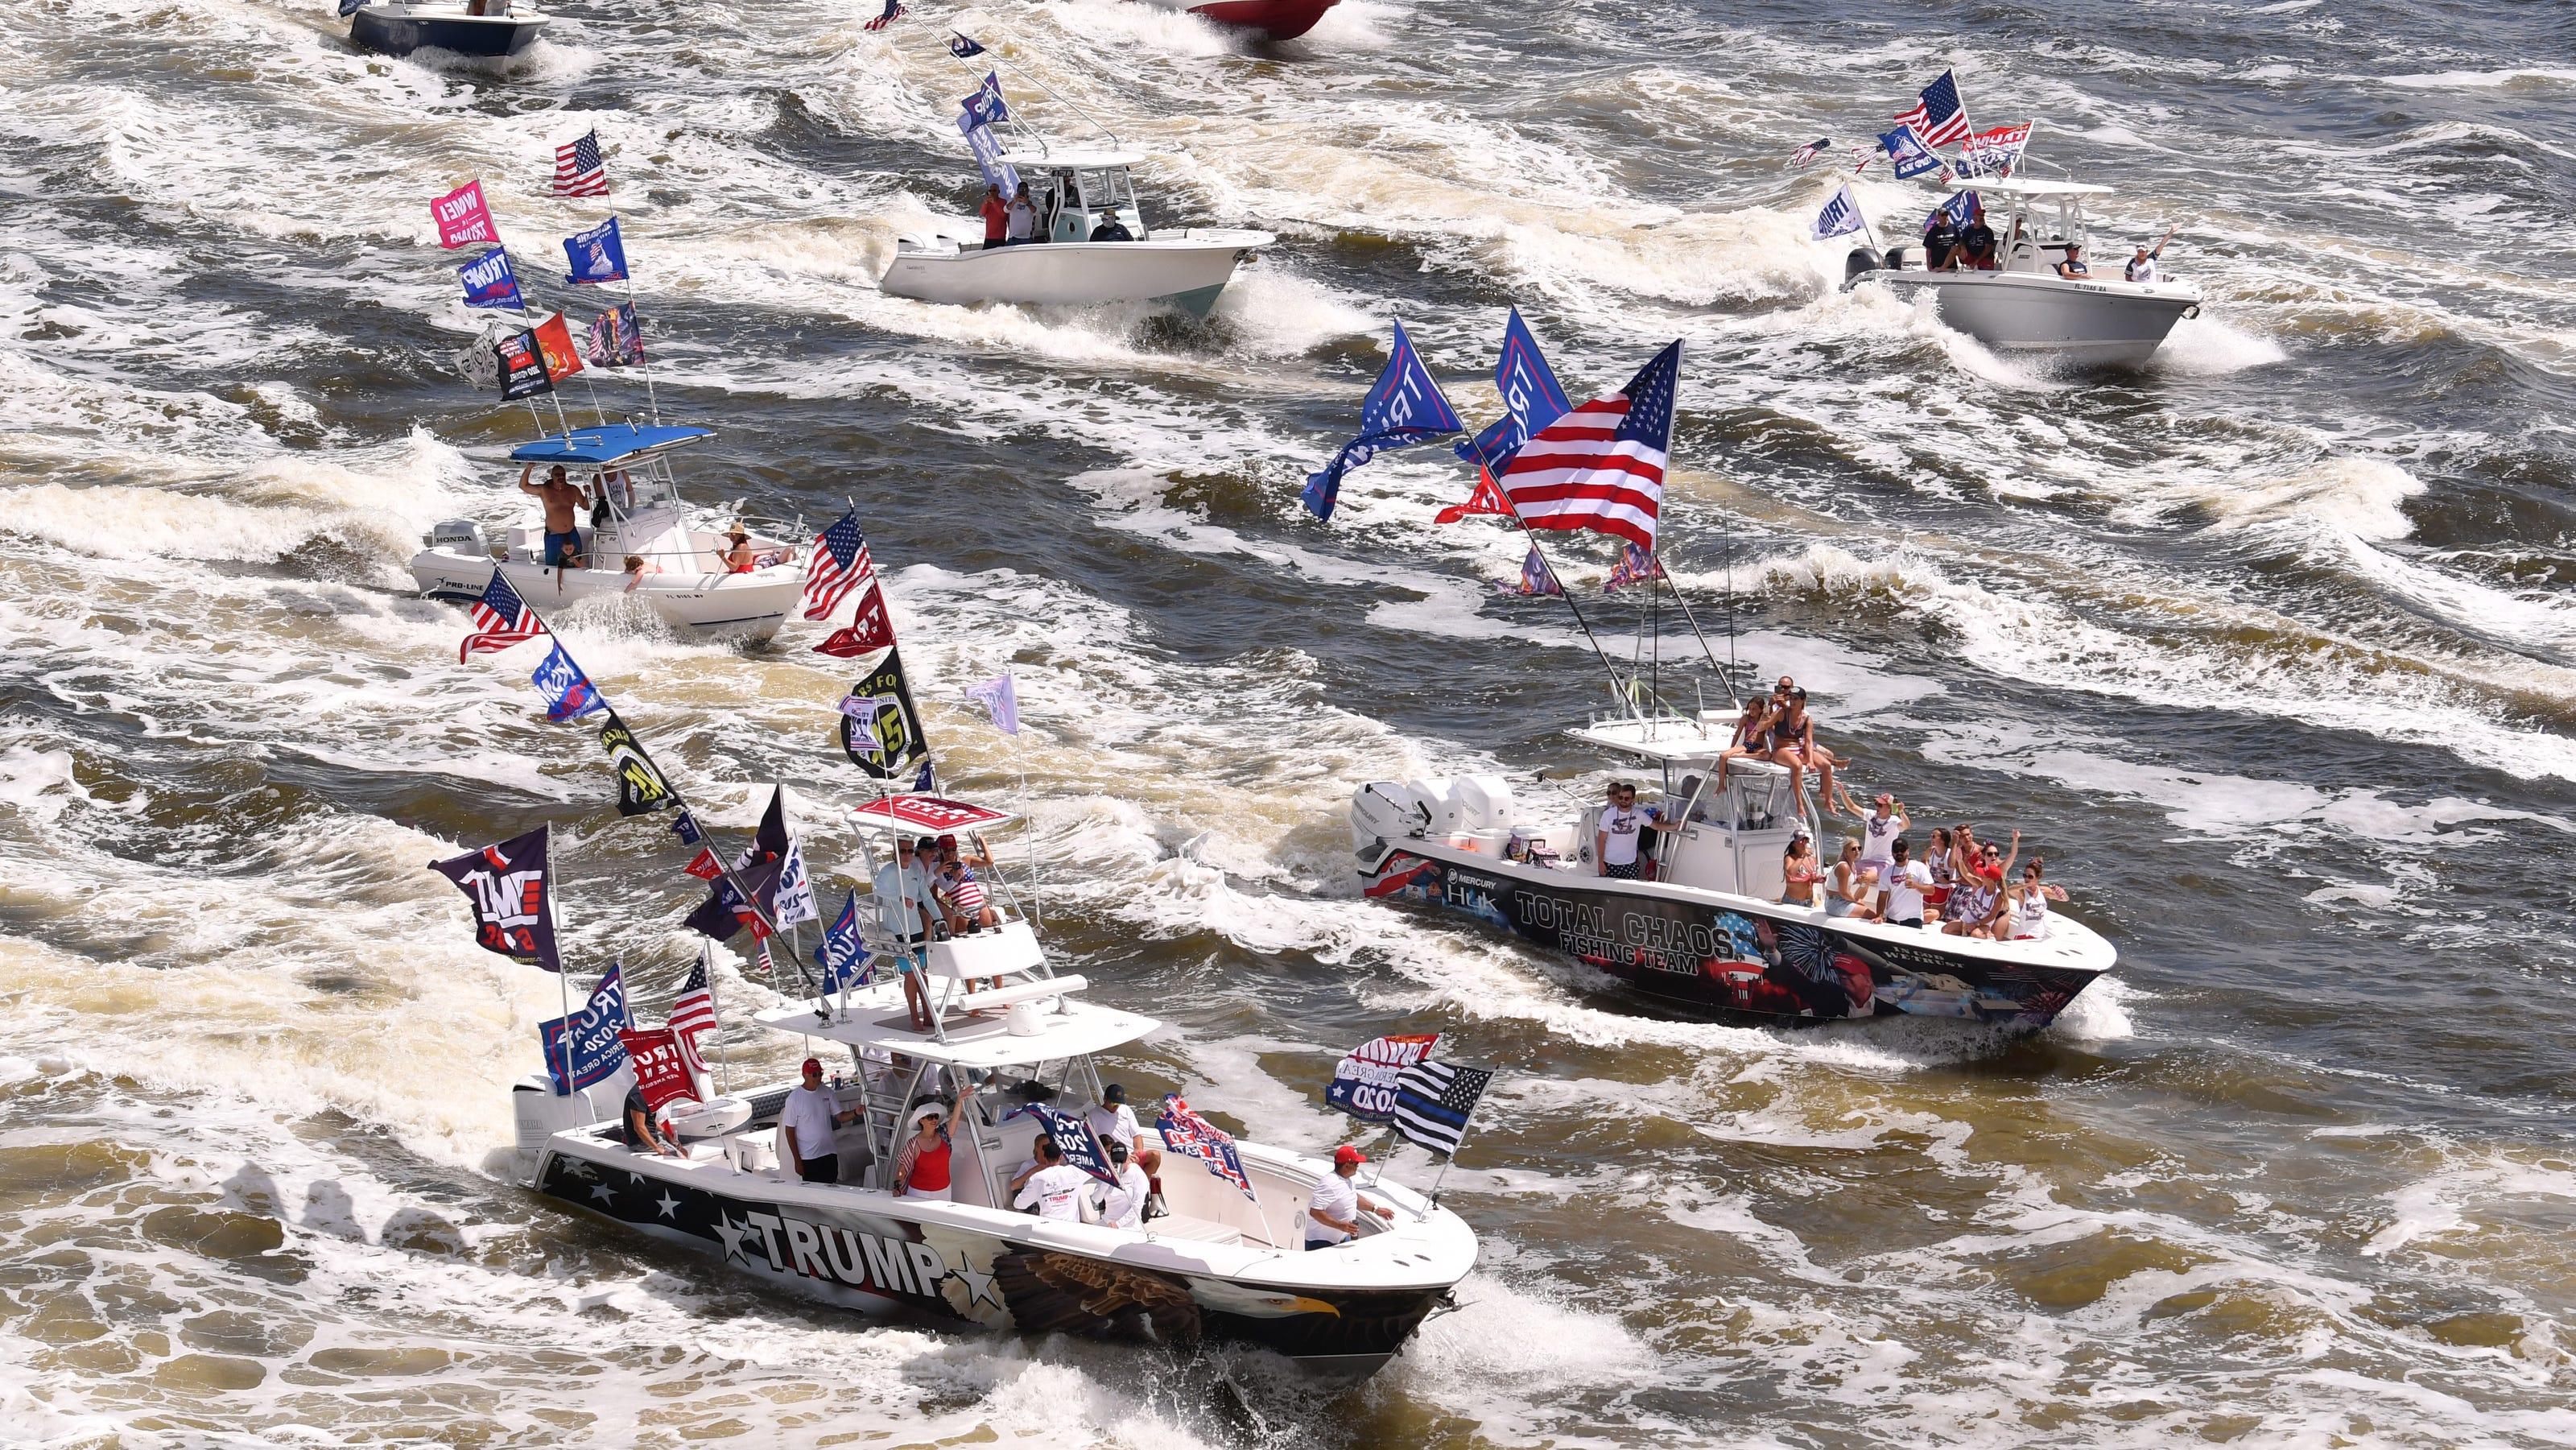 Trump Space Coast Boat Parade Draws Enormous Fleet Of Watercraft To Intracoastal Waterway